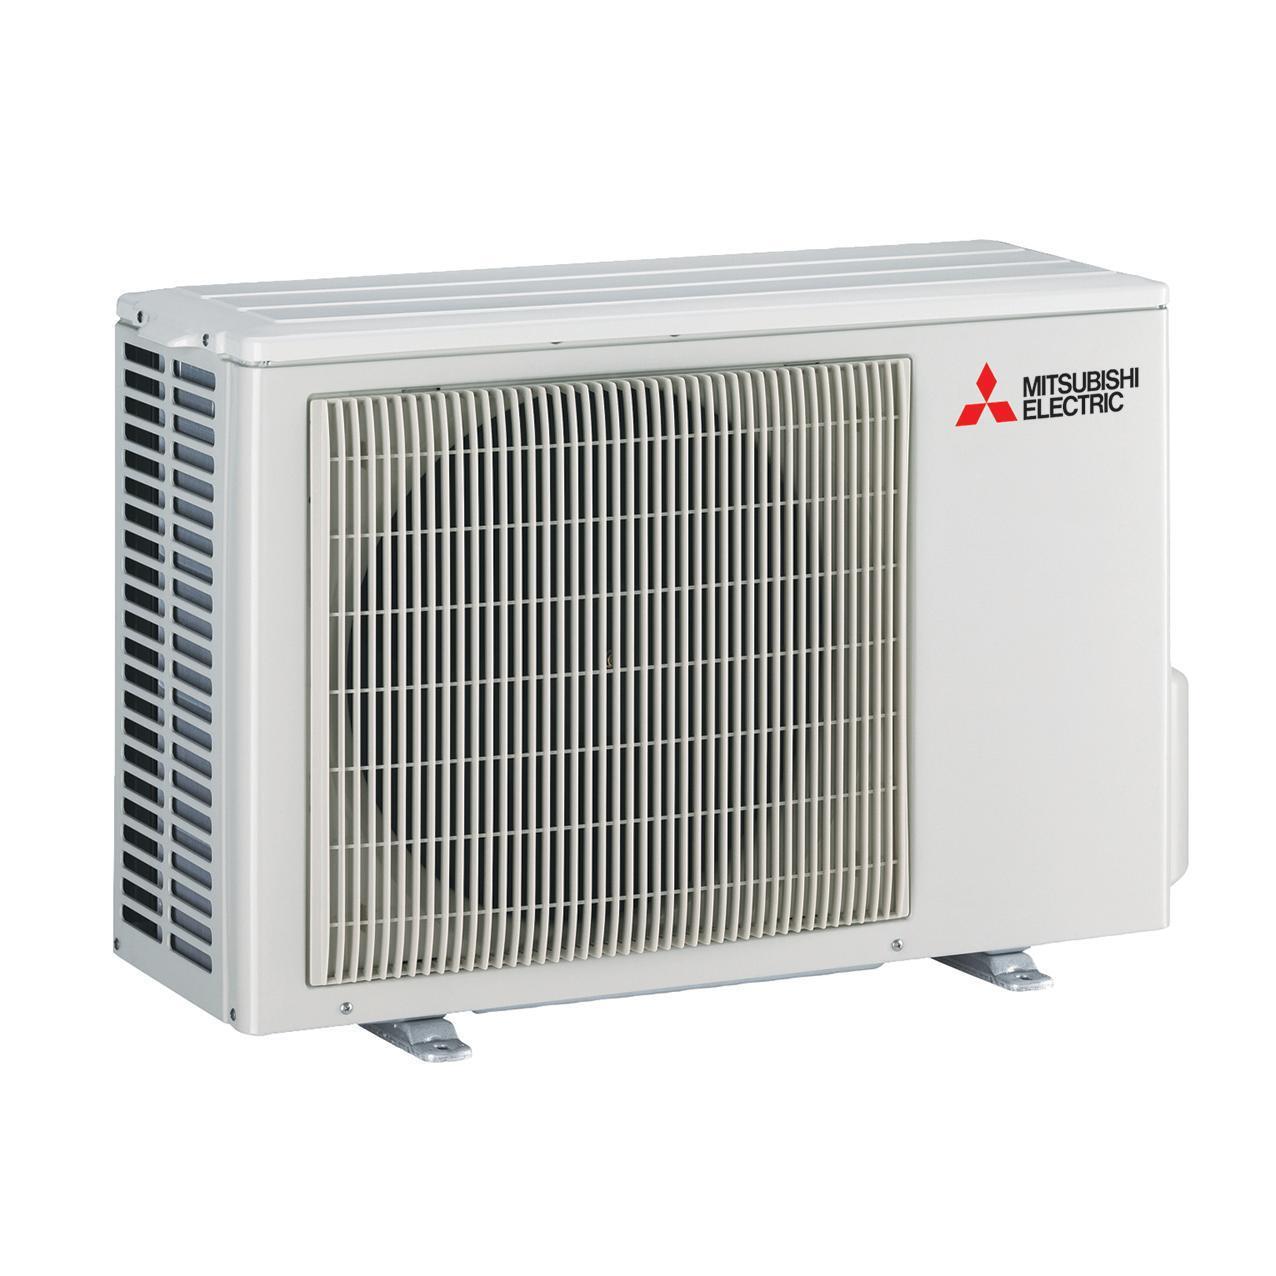 Climatizzatore dualsplit MITSUBISHI HR 13648 BTU - 3